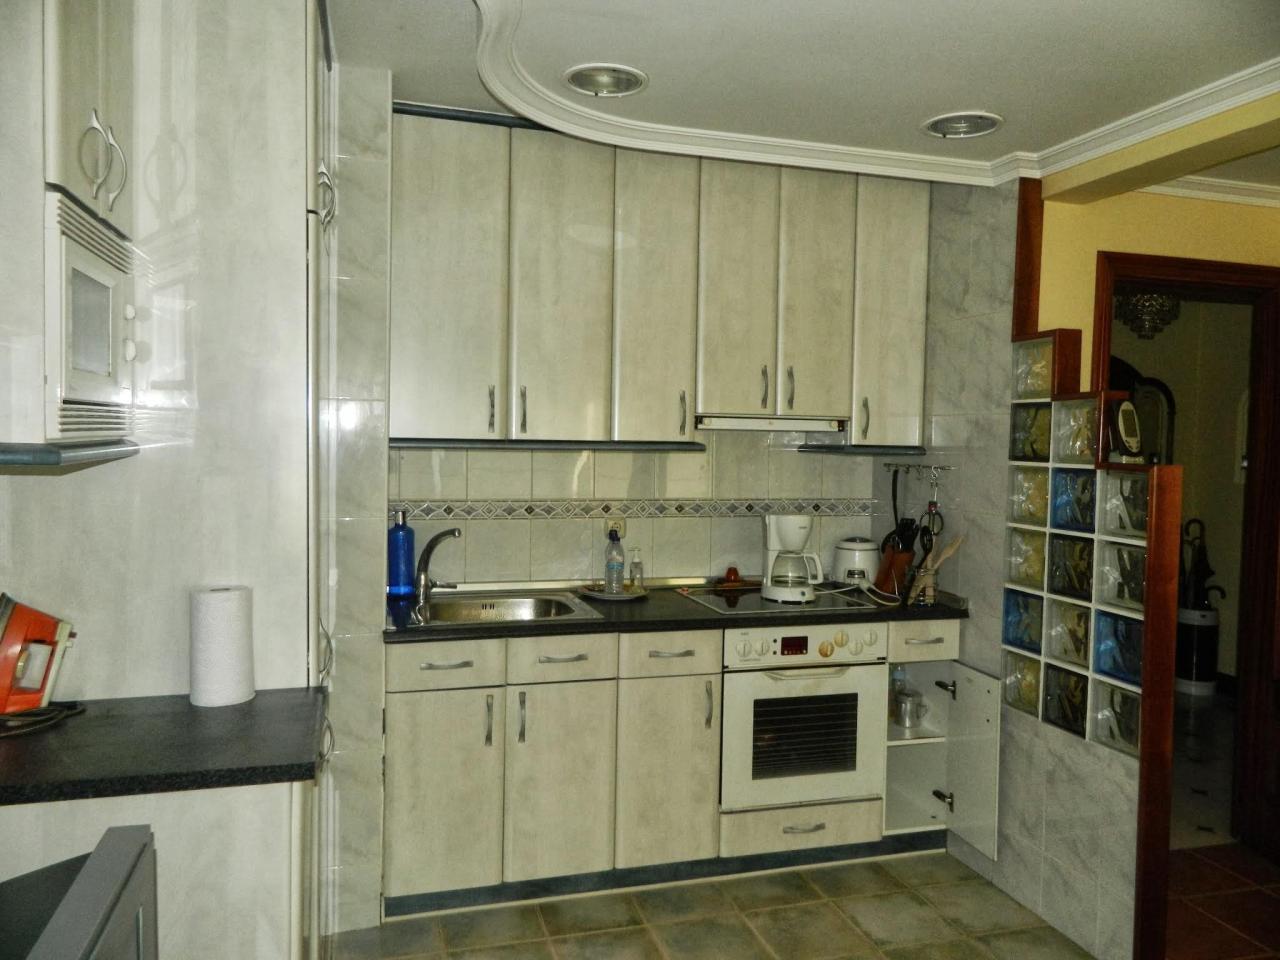 Apartamento vacacional Zarautz, Guipúzcoa